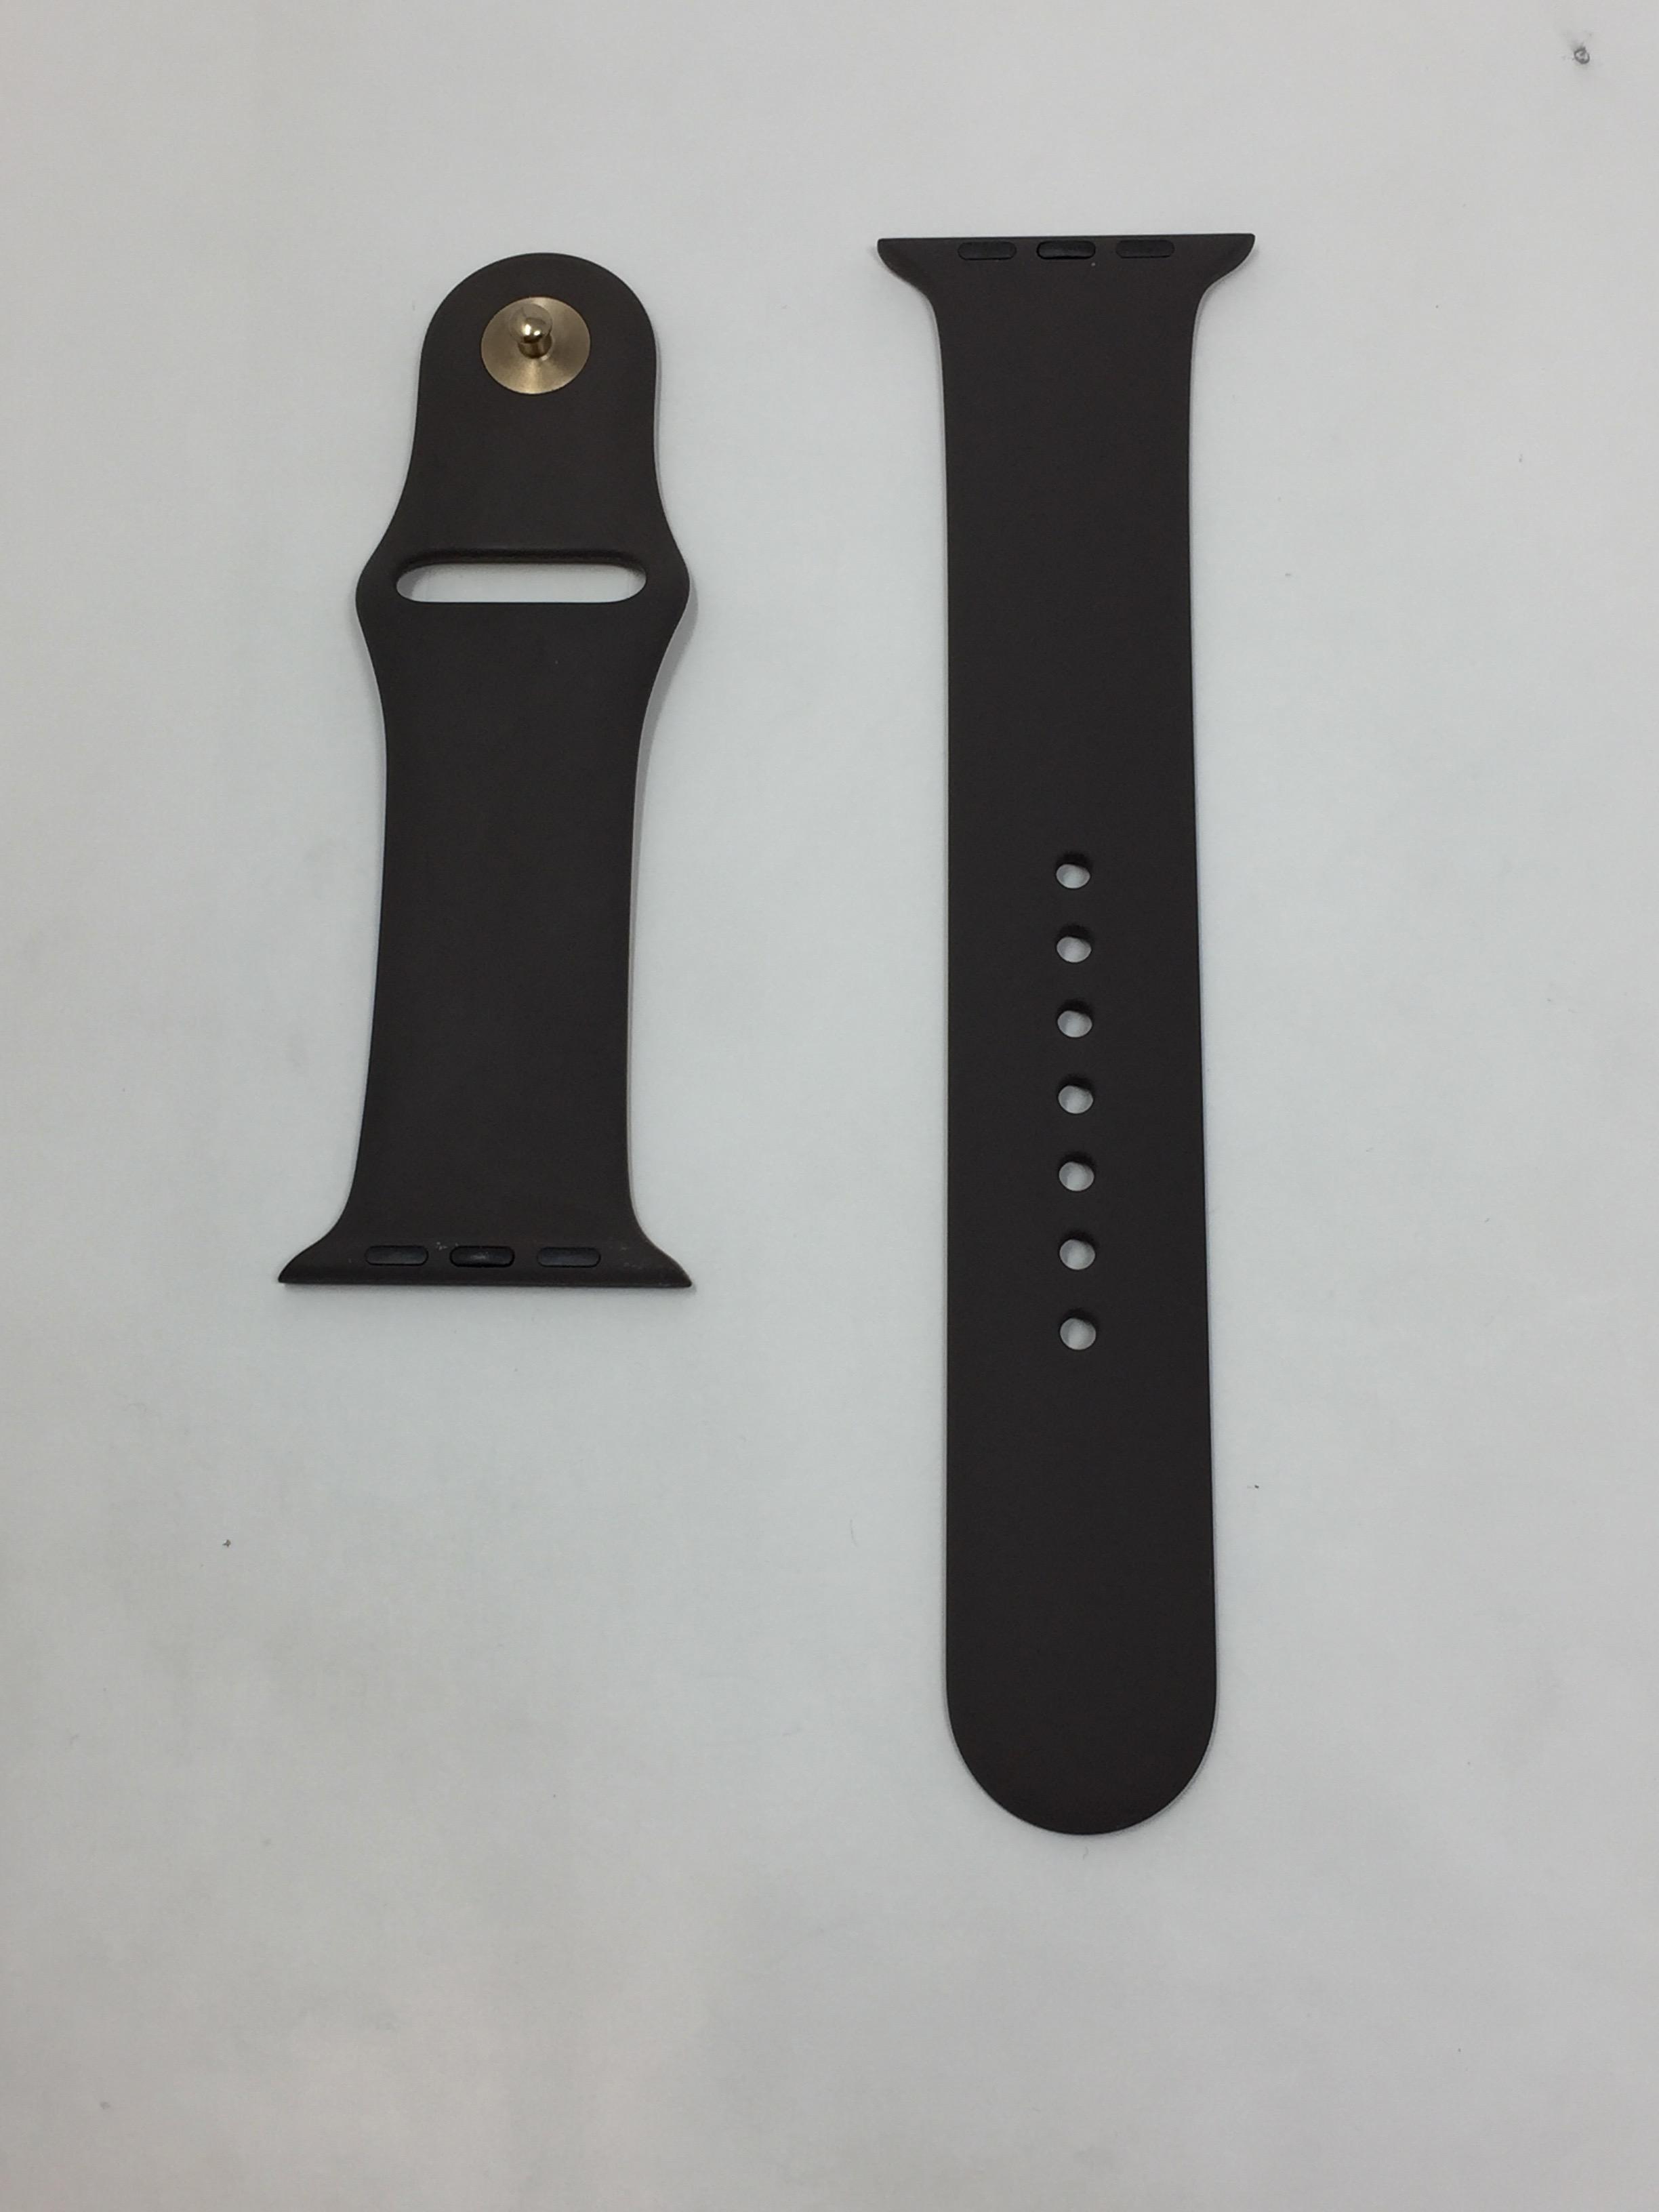 Watch Series 2 Aluminum (42mm), imagen 3